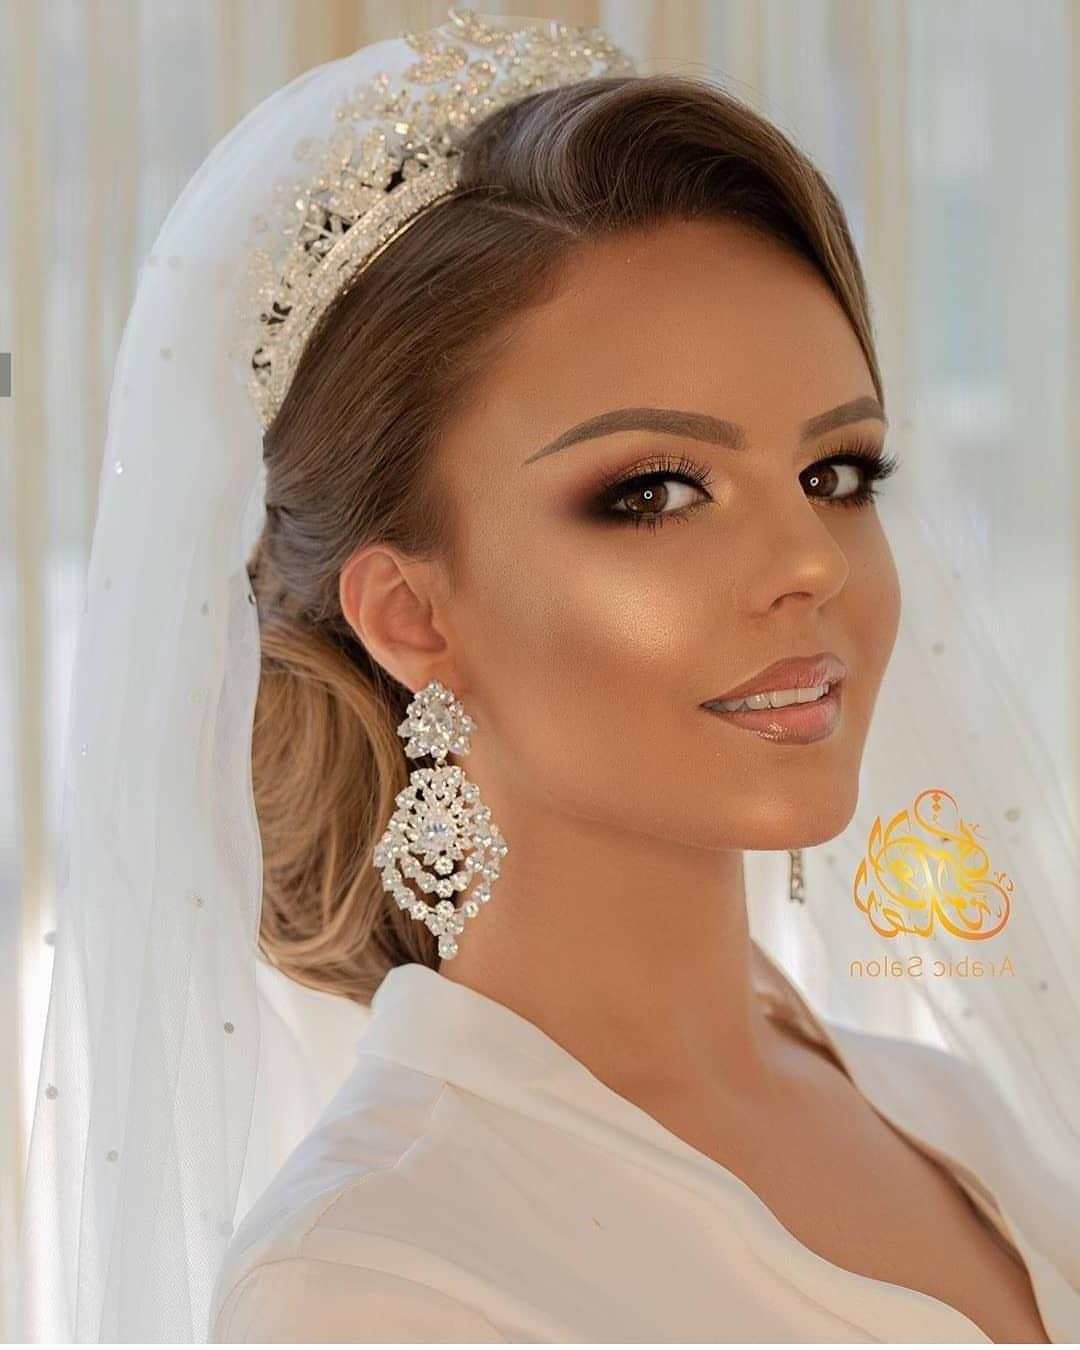 Inspirasi Model Baju Bridesmaid Hijab 2018 8ydm Dress Insta212 Instagram Web Viewer